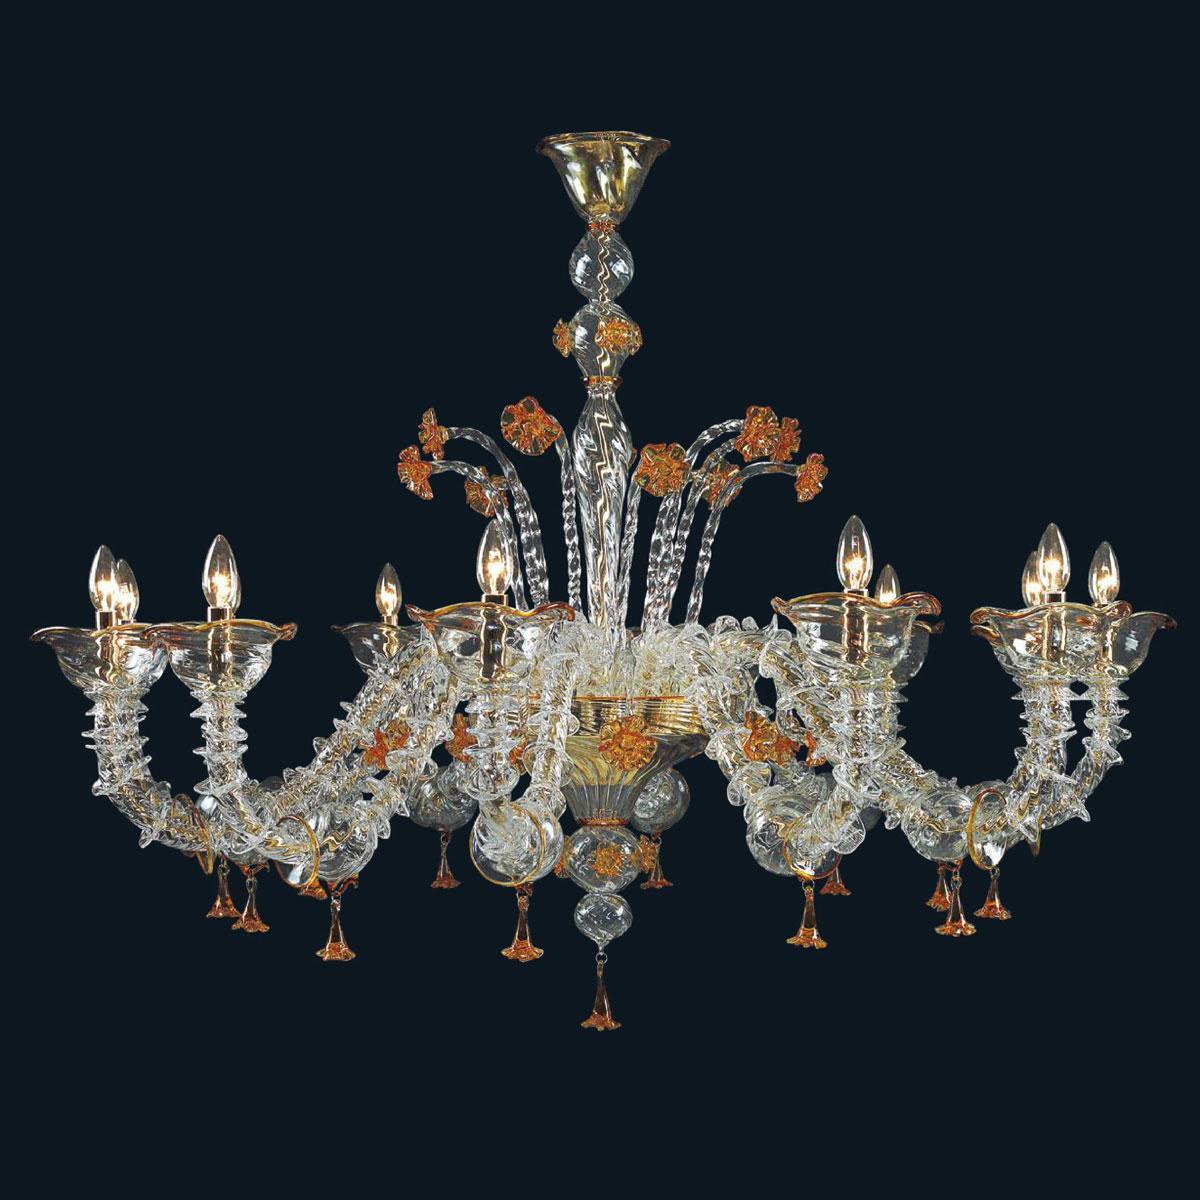 """Skylah"" Murano glass chandelier - 12 lights - transparent and amber"